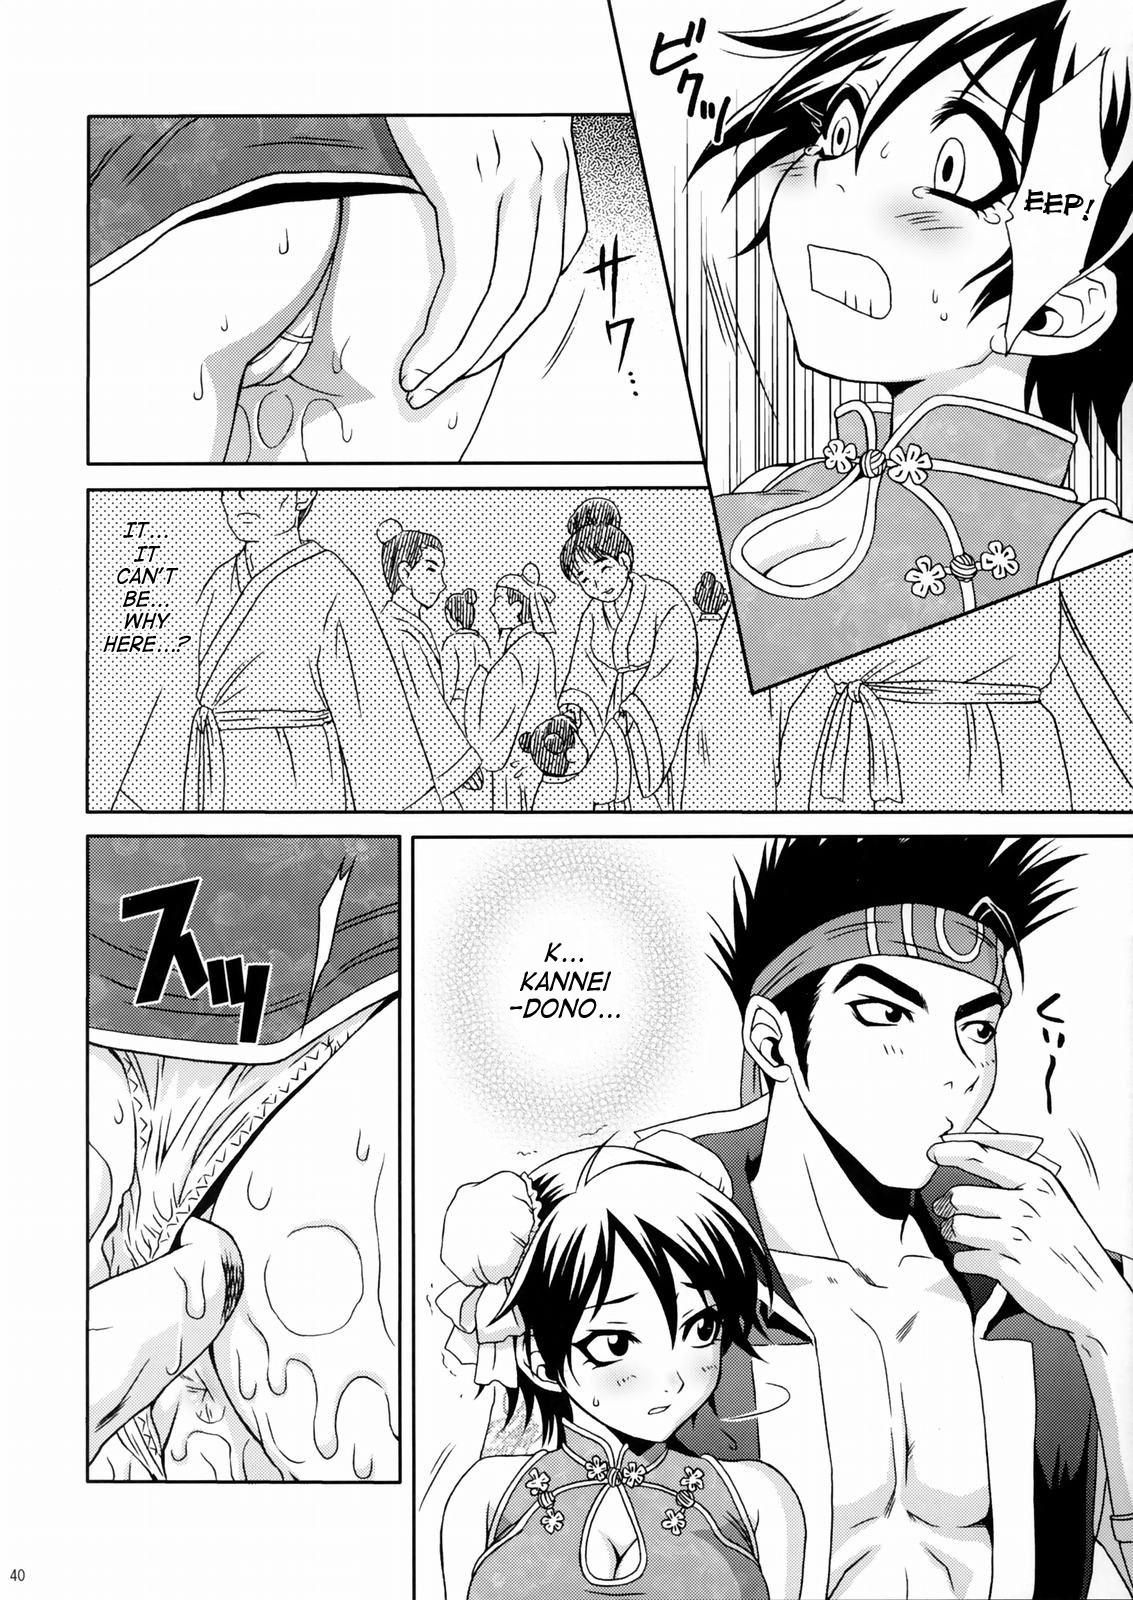 (C66) [U.R.C (Momoya Show-Neko)] Rikuson-chan ~Lovely Gunshi no Himitsu~ | Rikuson-chan Secret of The Lovely Strategist (Dynasty Warriors) [English] [SaHa] 38